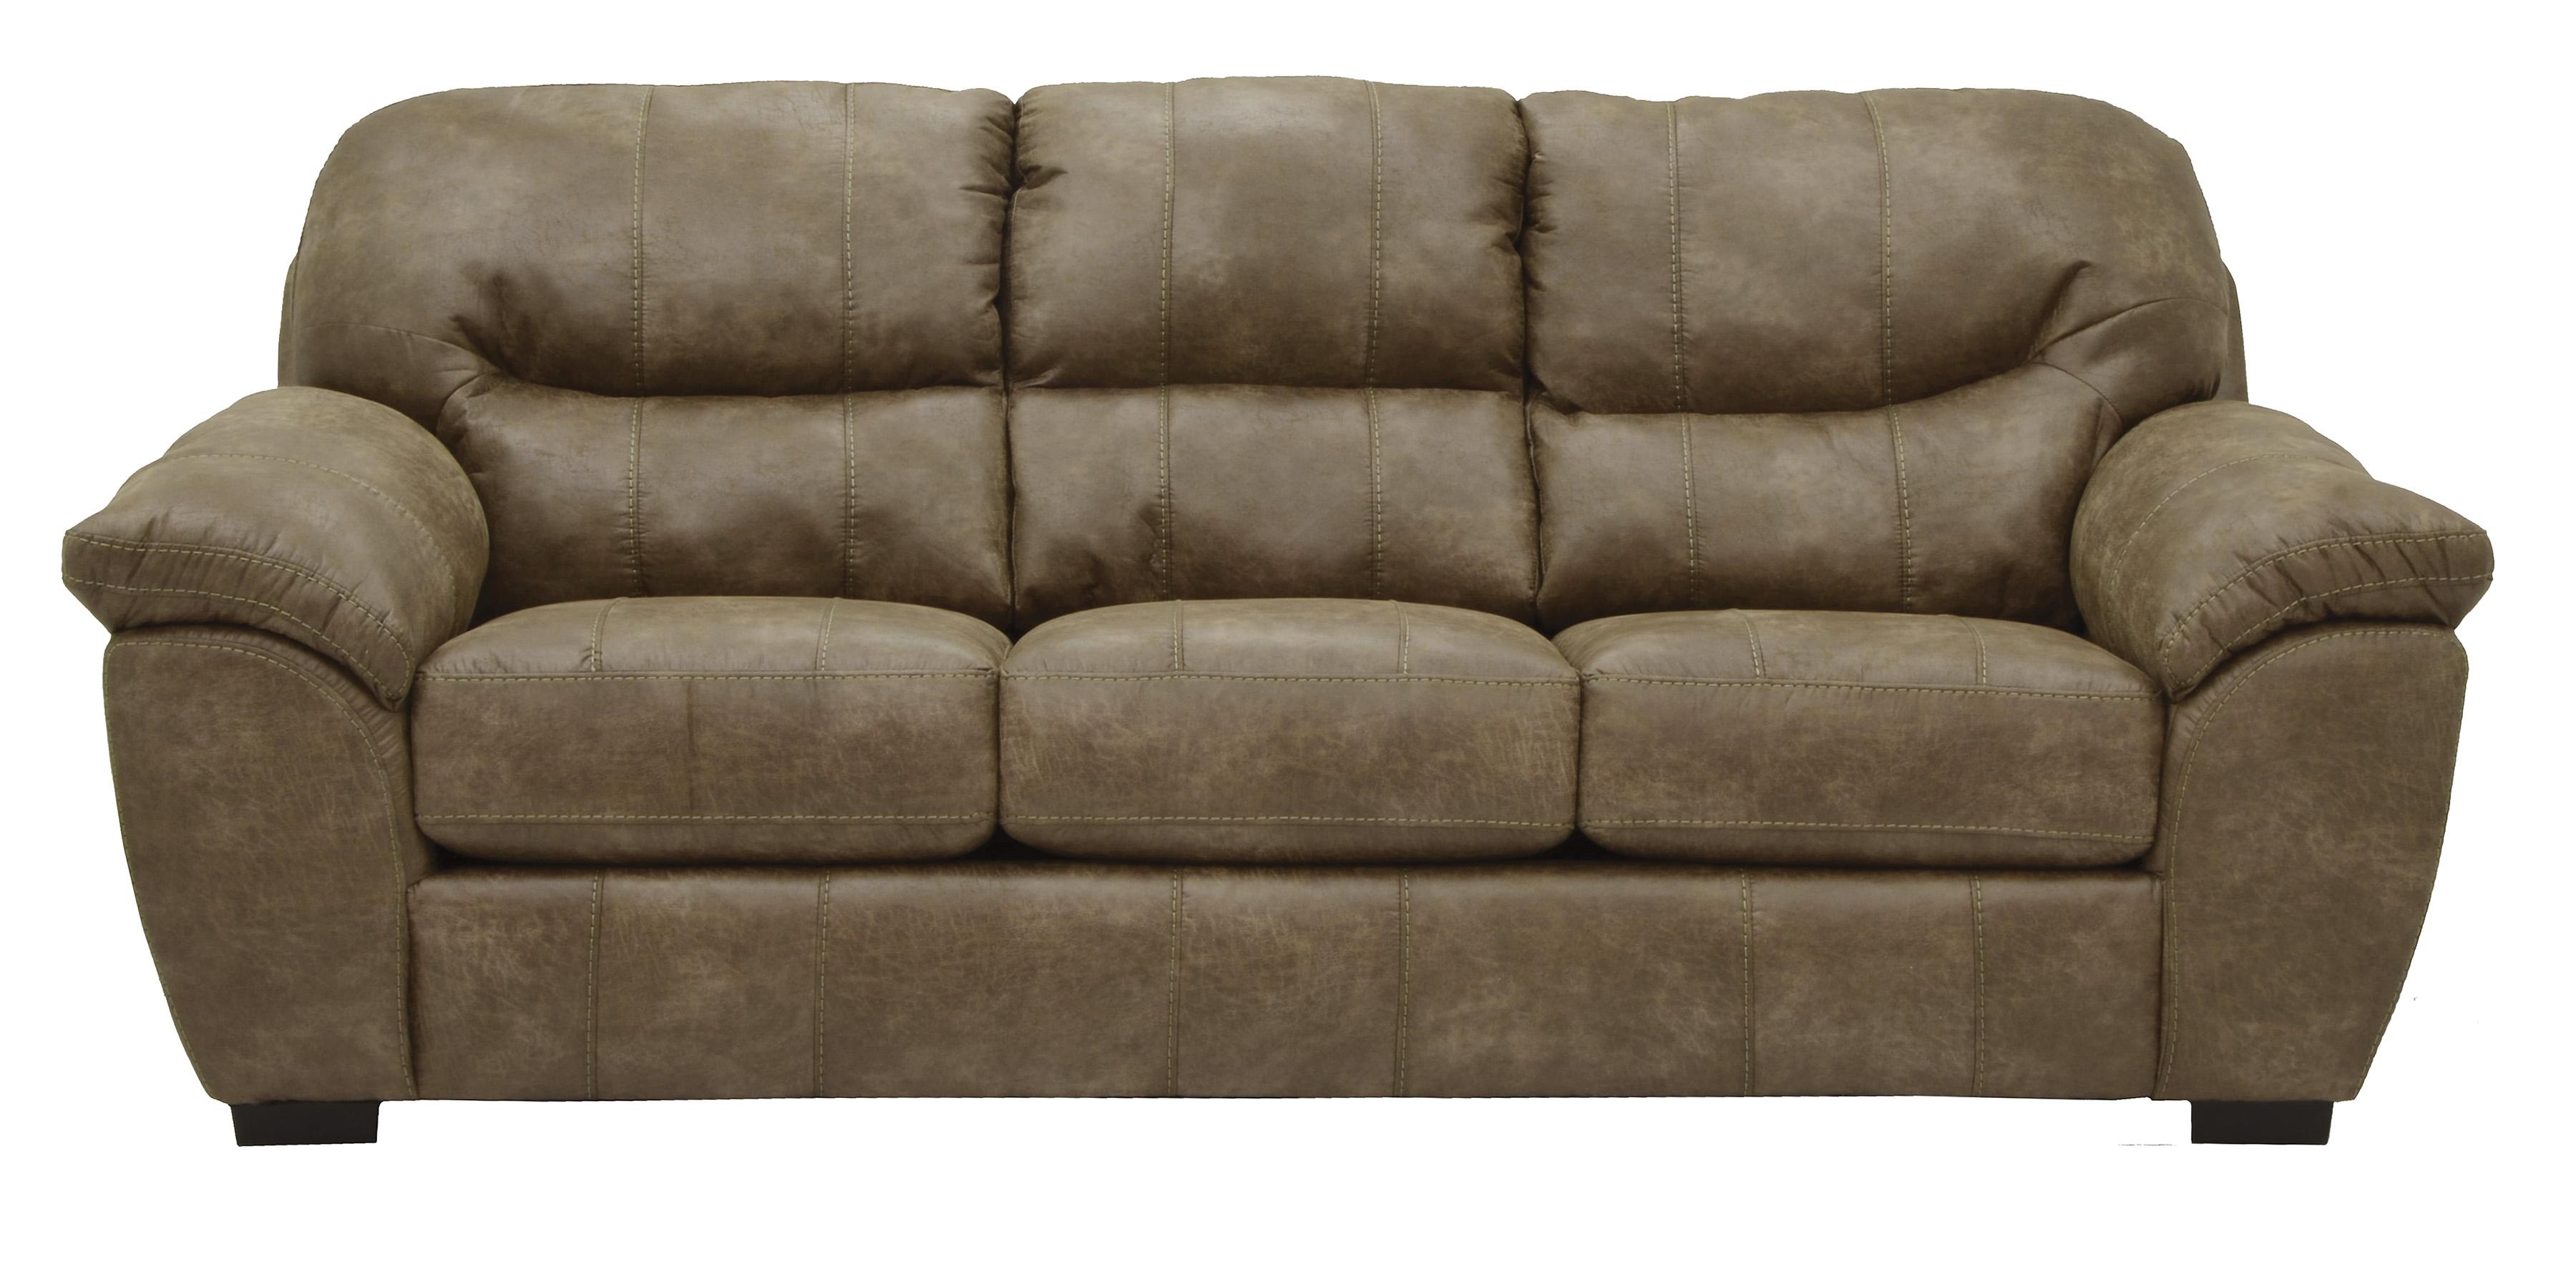 Enjoyable Grant 4453 Bonded Leather 96 Sofa Sofas And Sectionals Evergreenethics Interior Chair Design Evergreenethicsorg